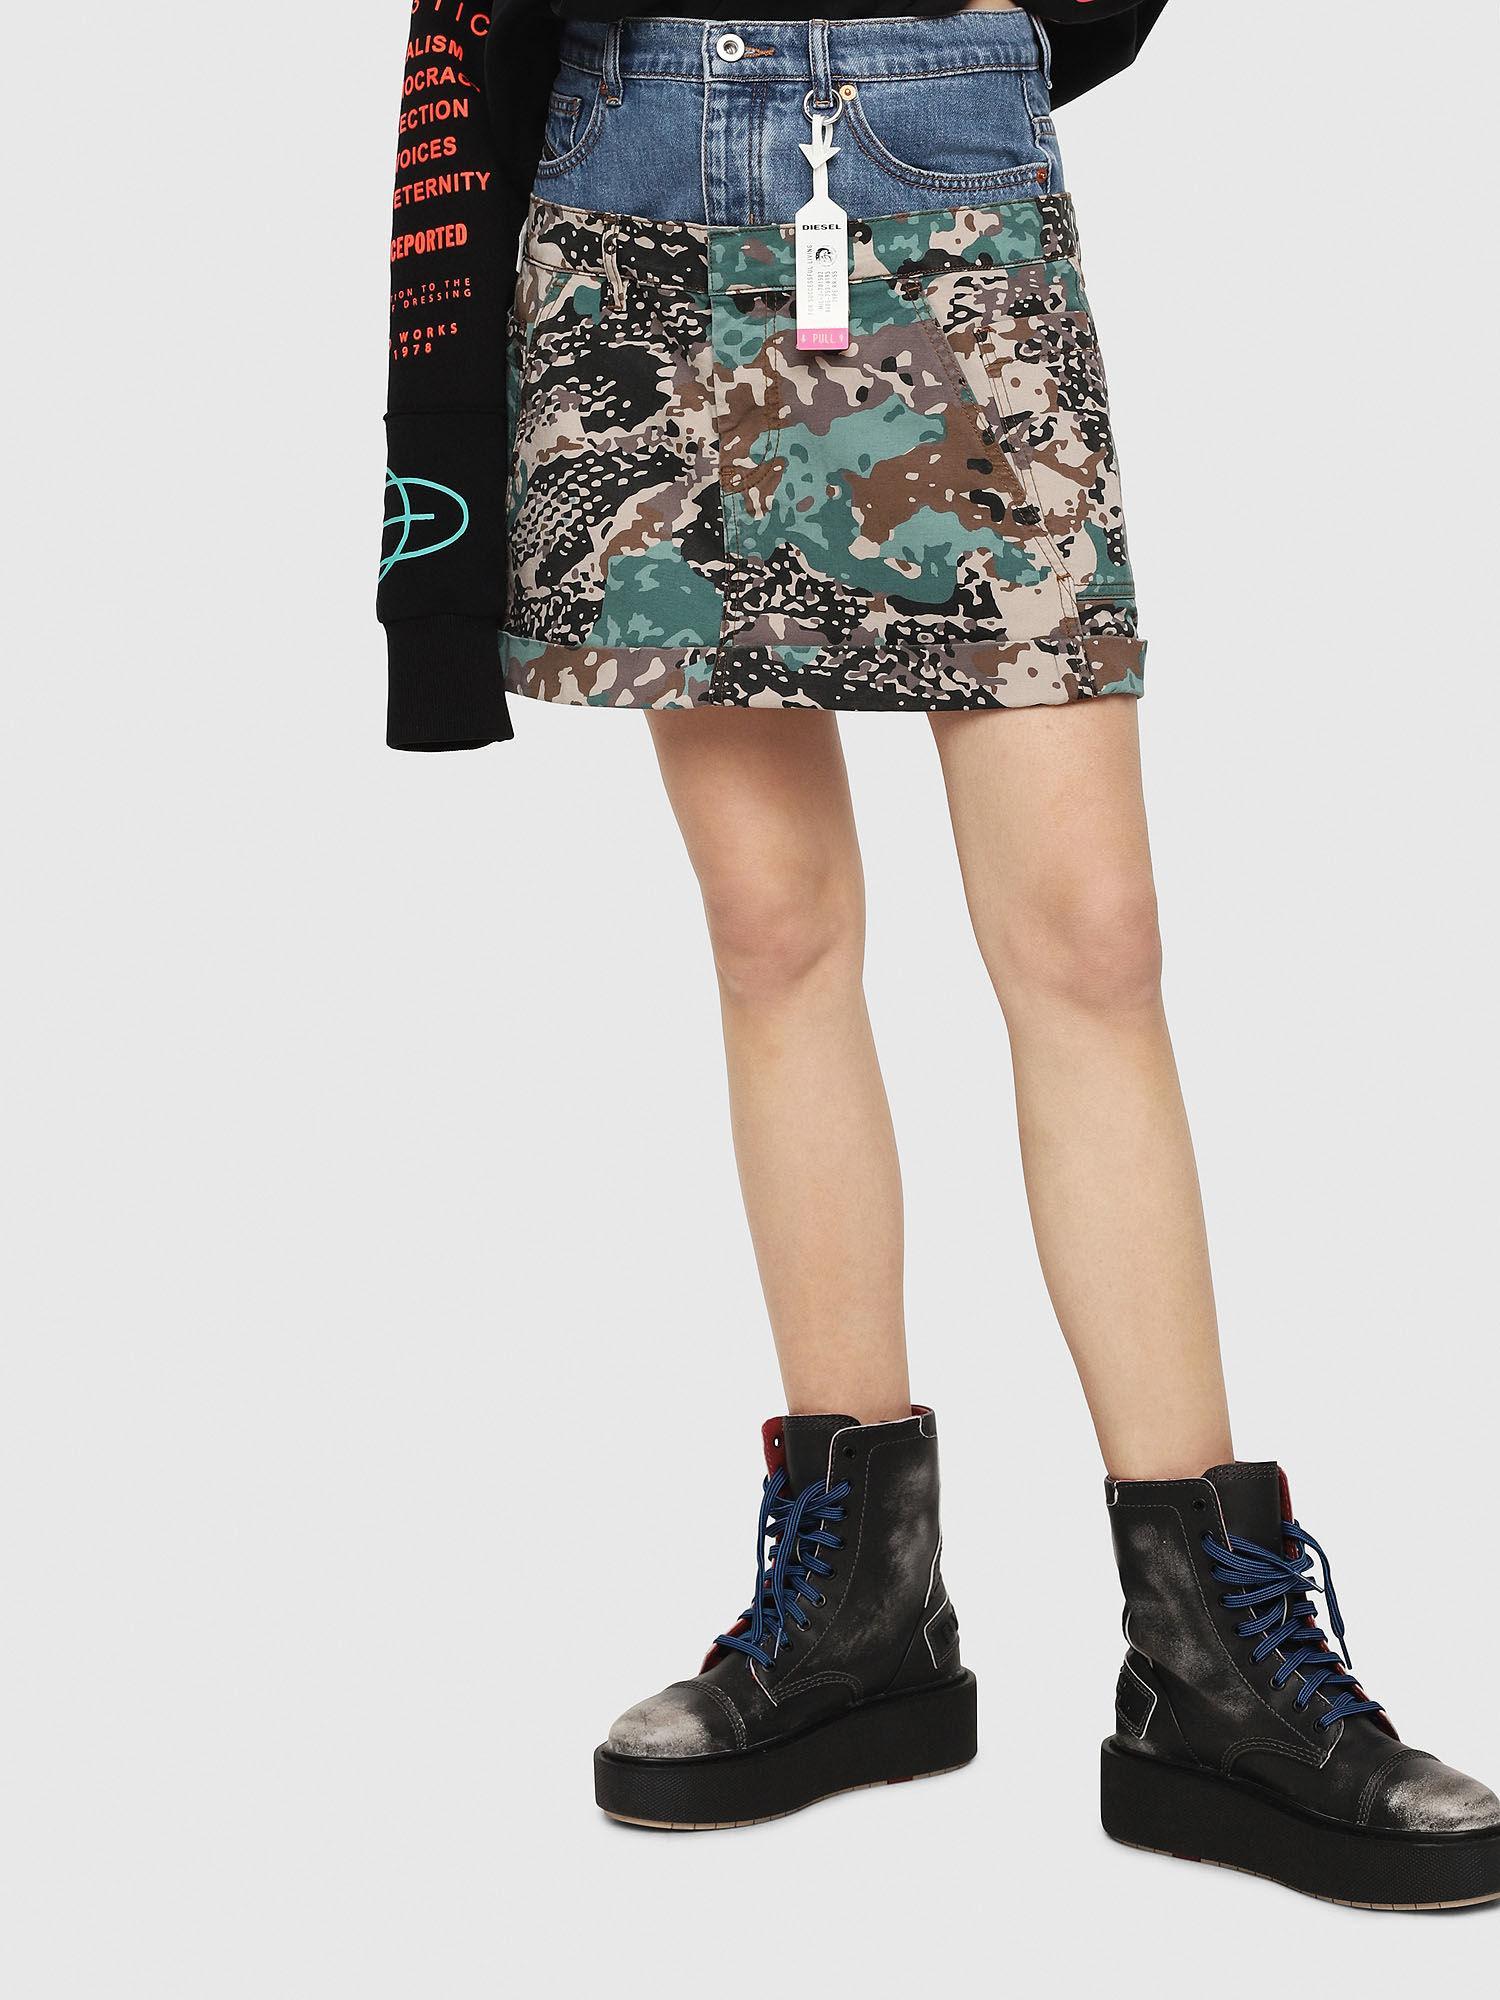 adb373a0c9b DIESEL. Women s Hybrid Skirt In Cotton And Denim